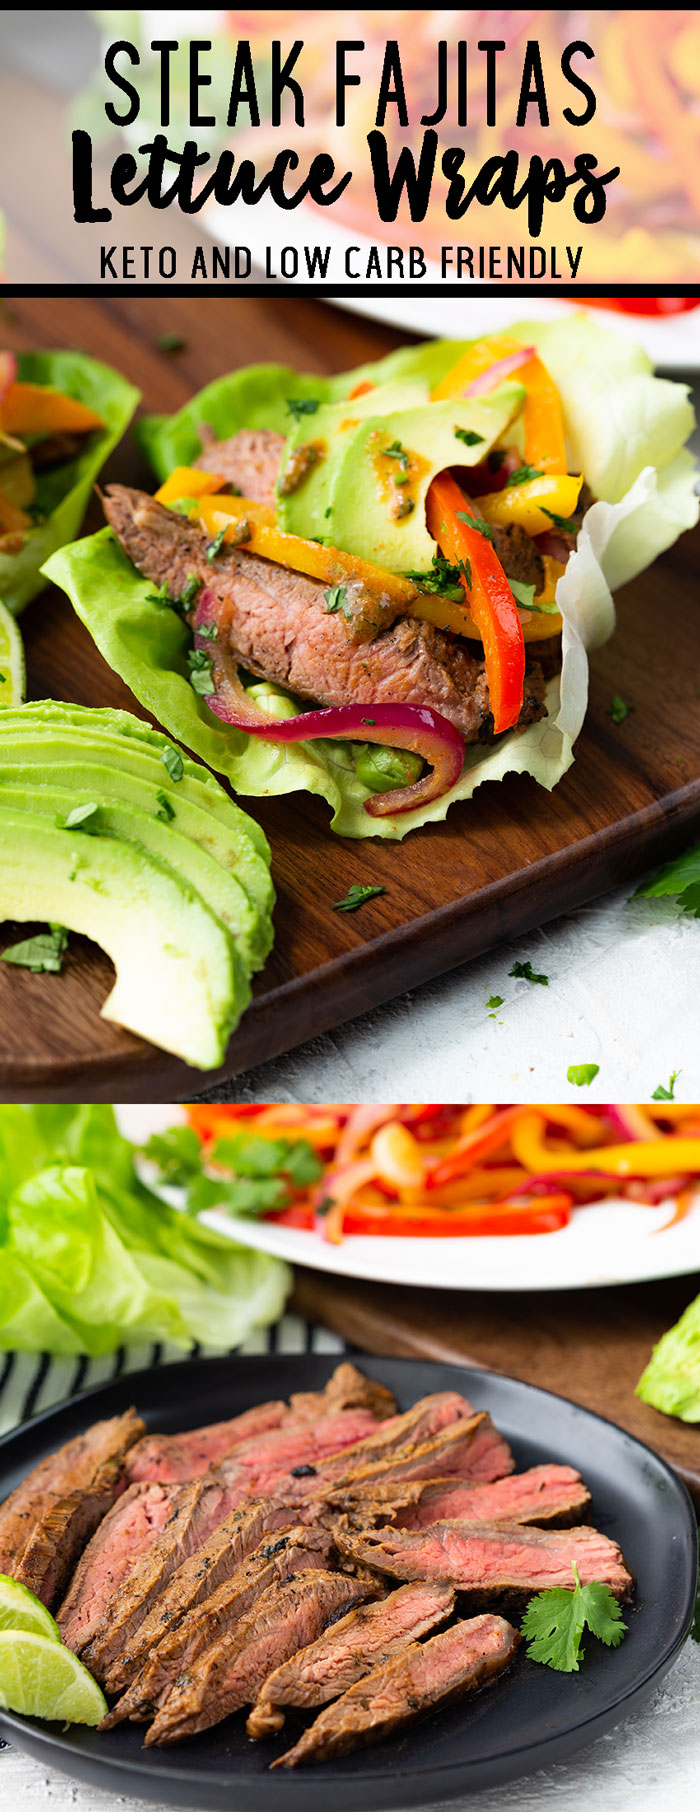 Steak Fajitas lettuce wraps